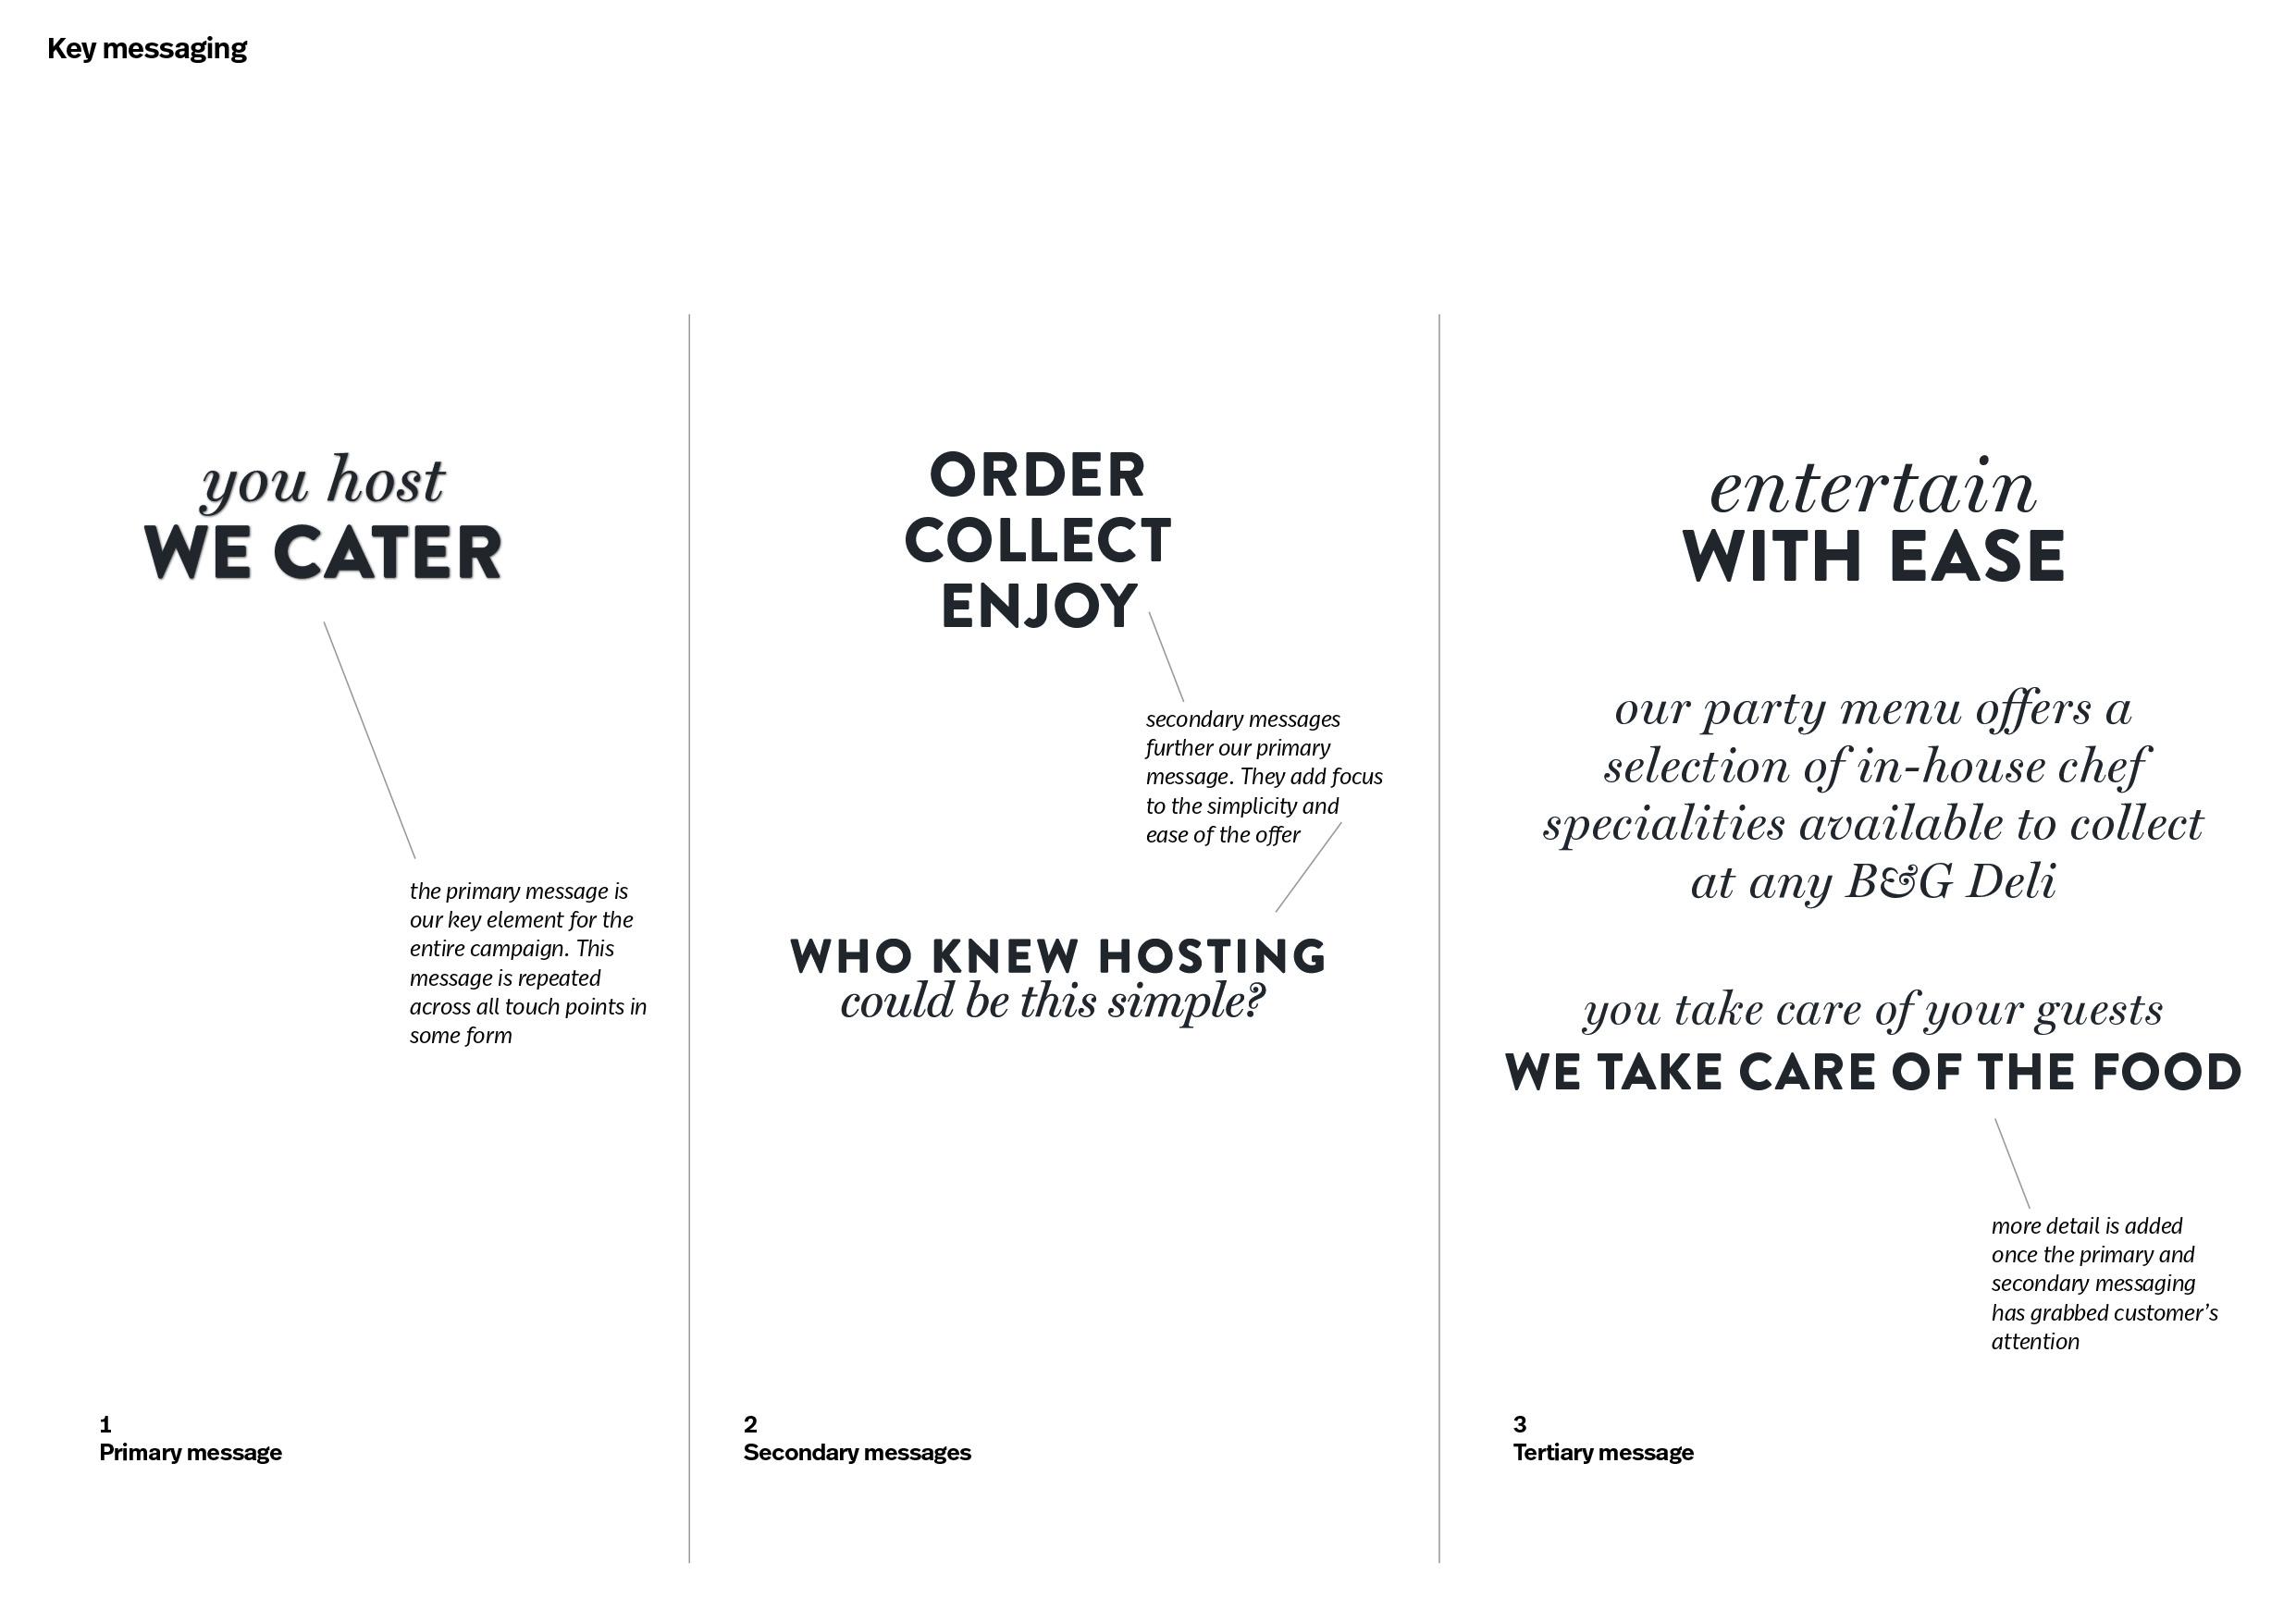 brennan_and_stevens_Baxter_and_Greene_Design